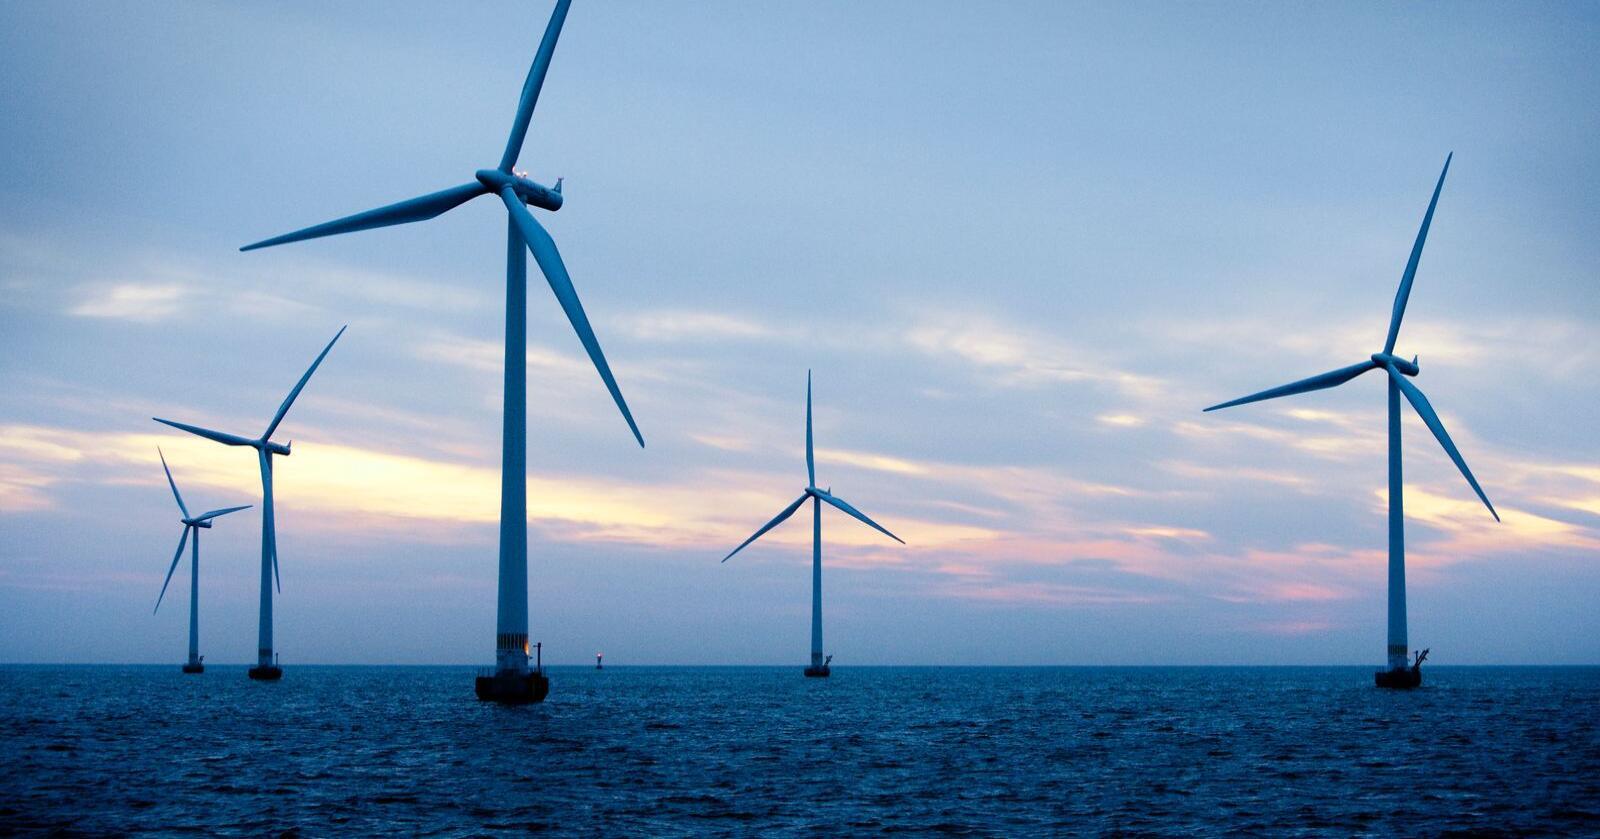 Vindkraft til havs kan bli en betydelig næring.  Foto: Ty Stange / Ritzau Scanpix / NTB